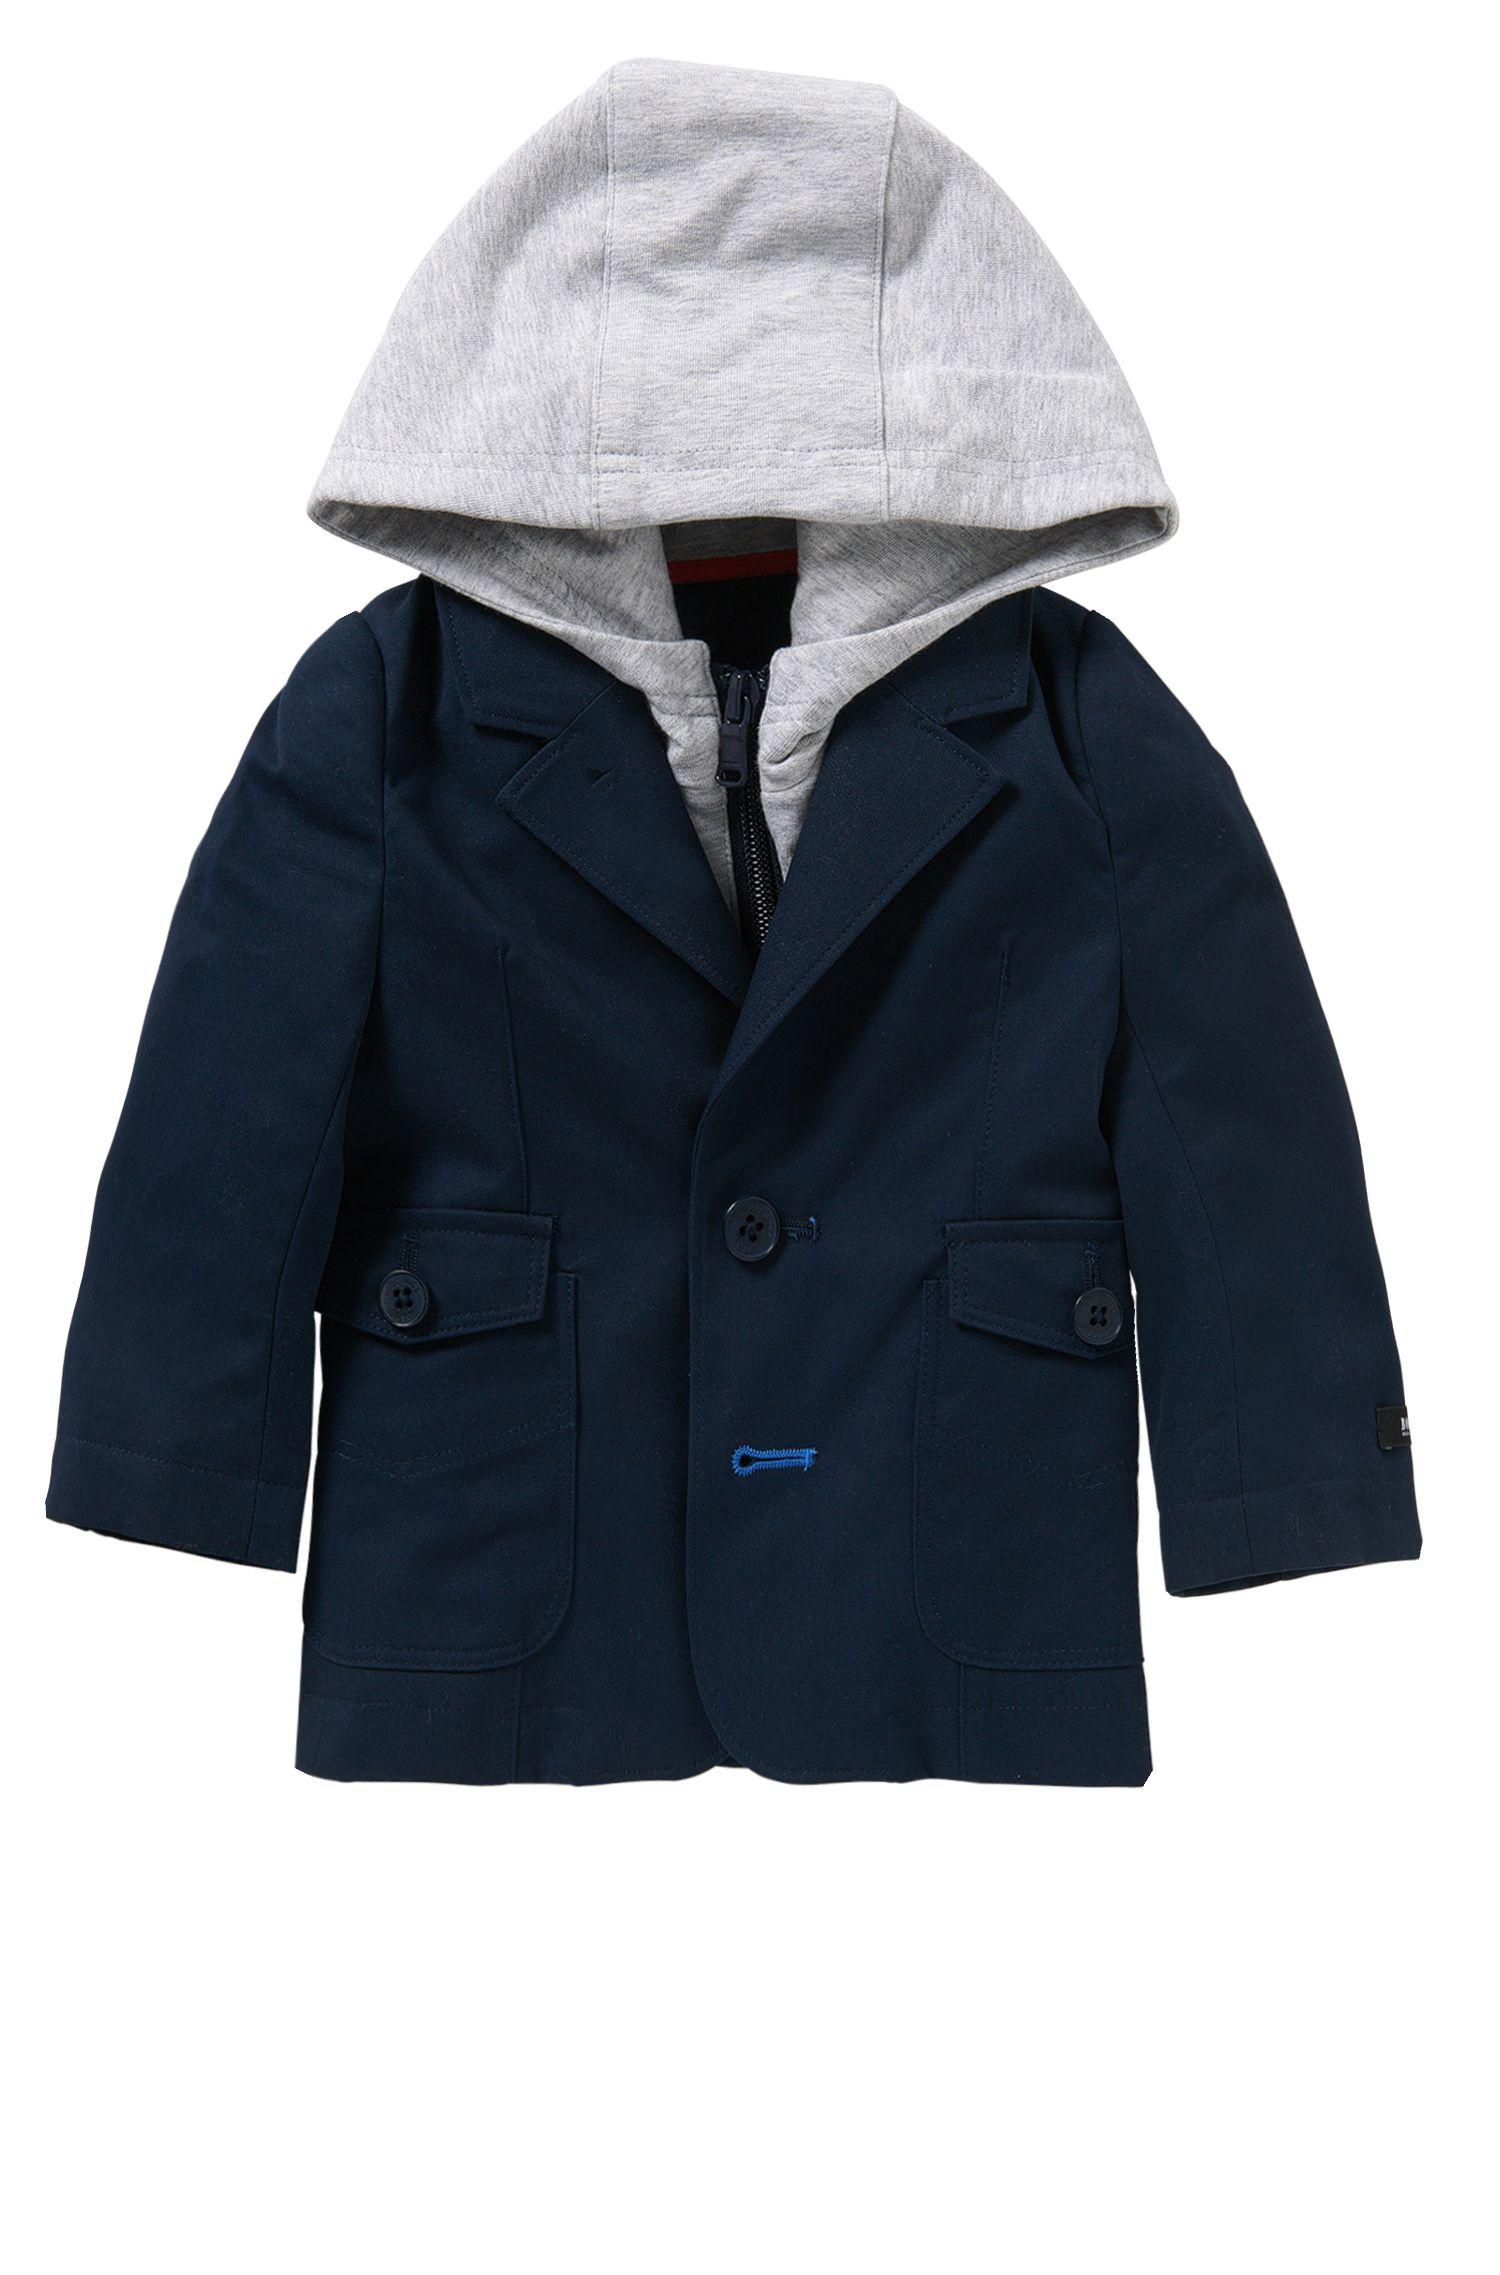 'J06138'   Newborn Cotton Sport Coat, Detachable Hood